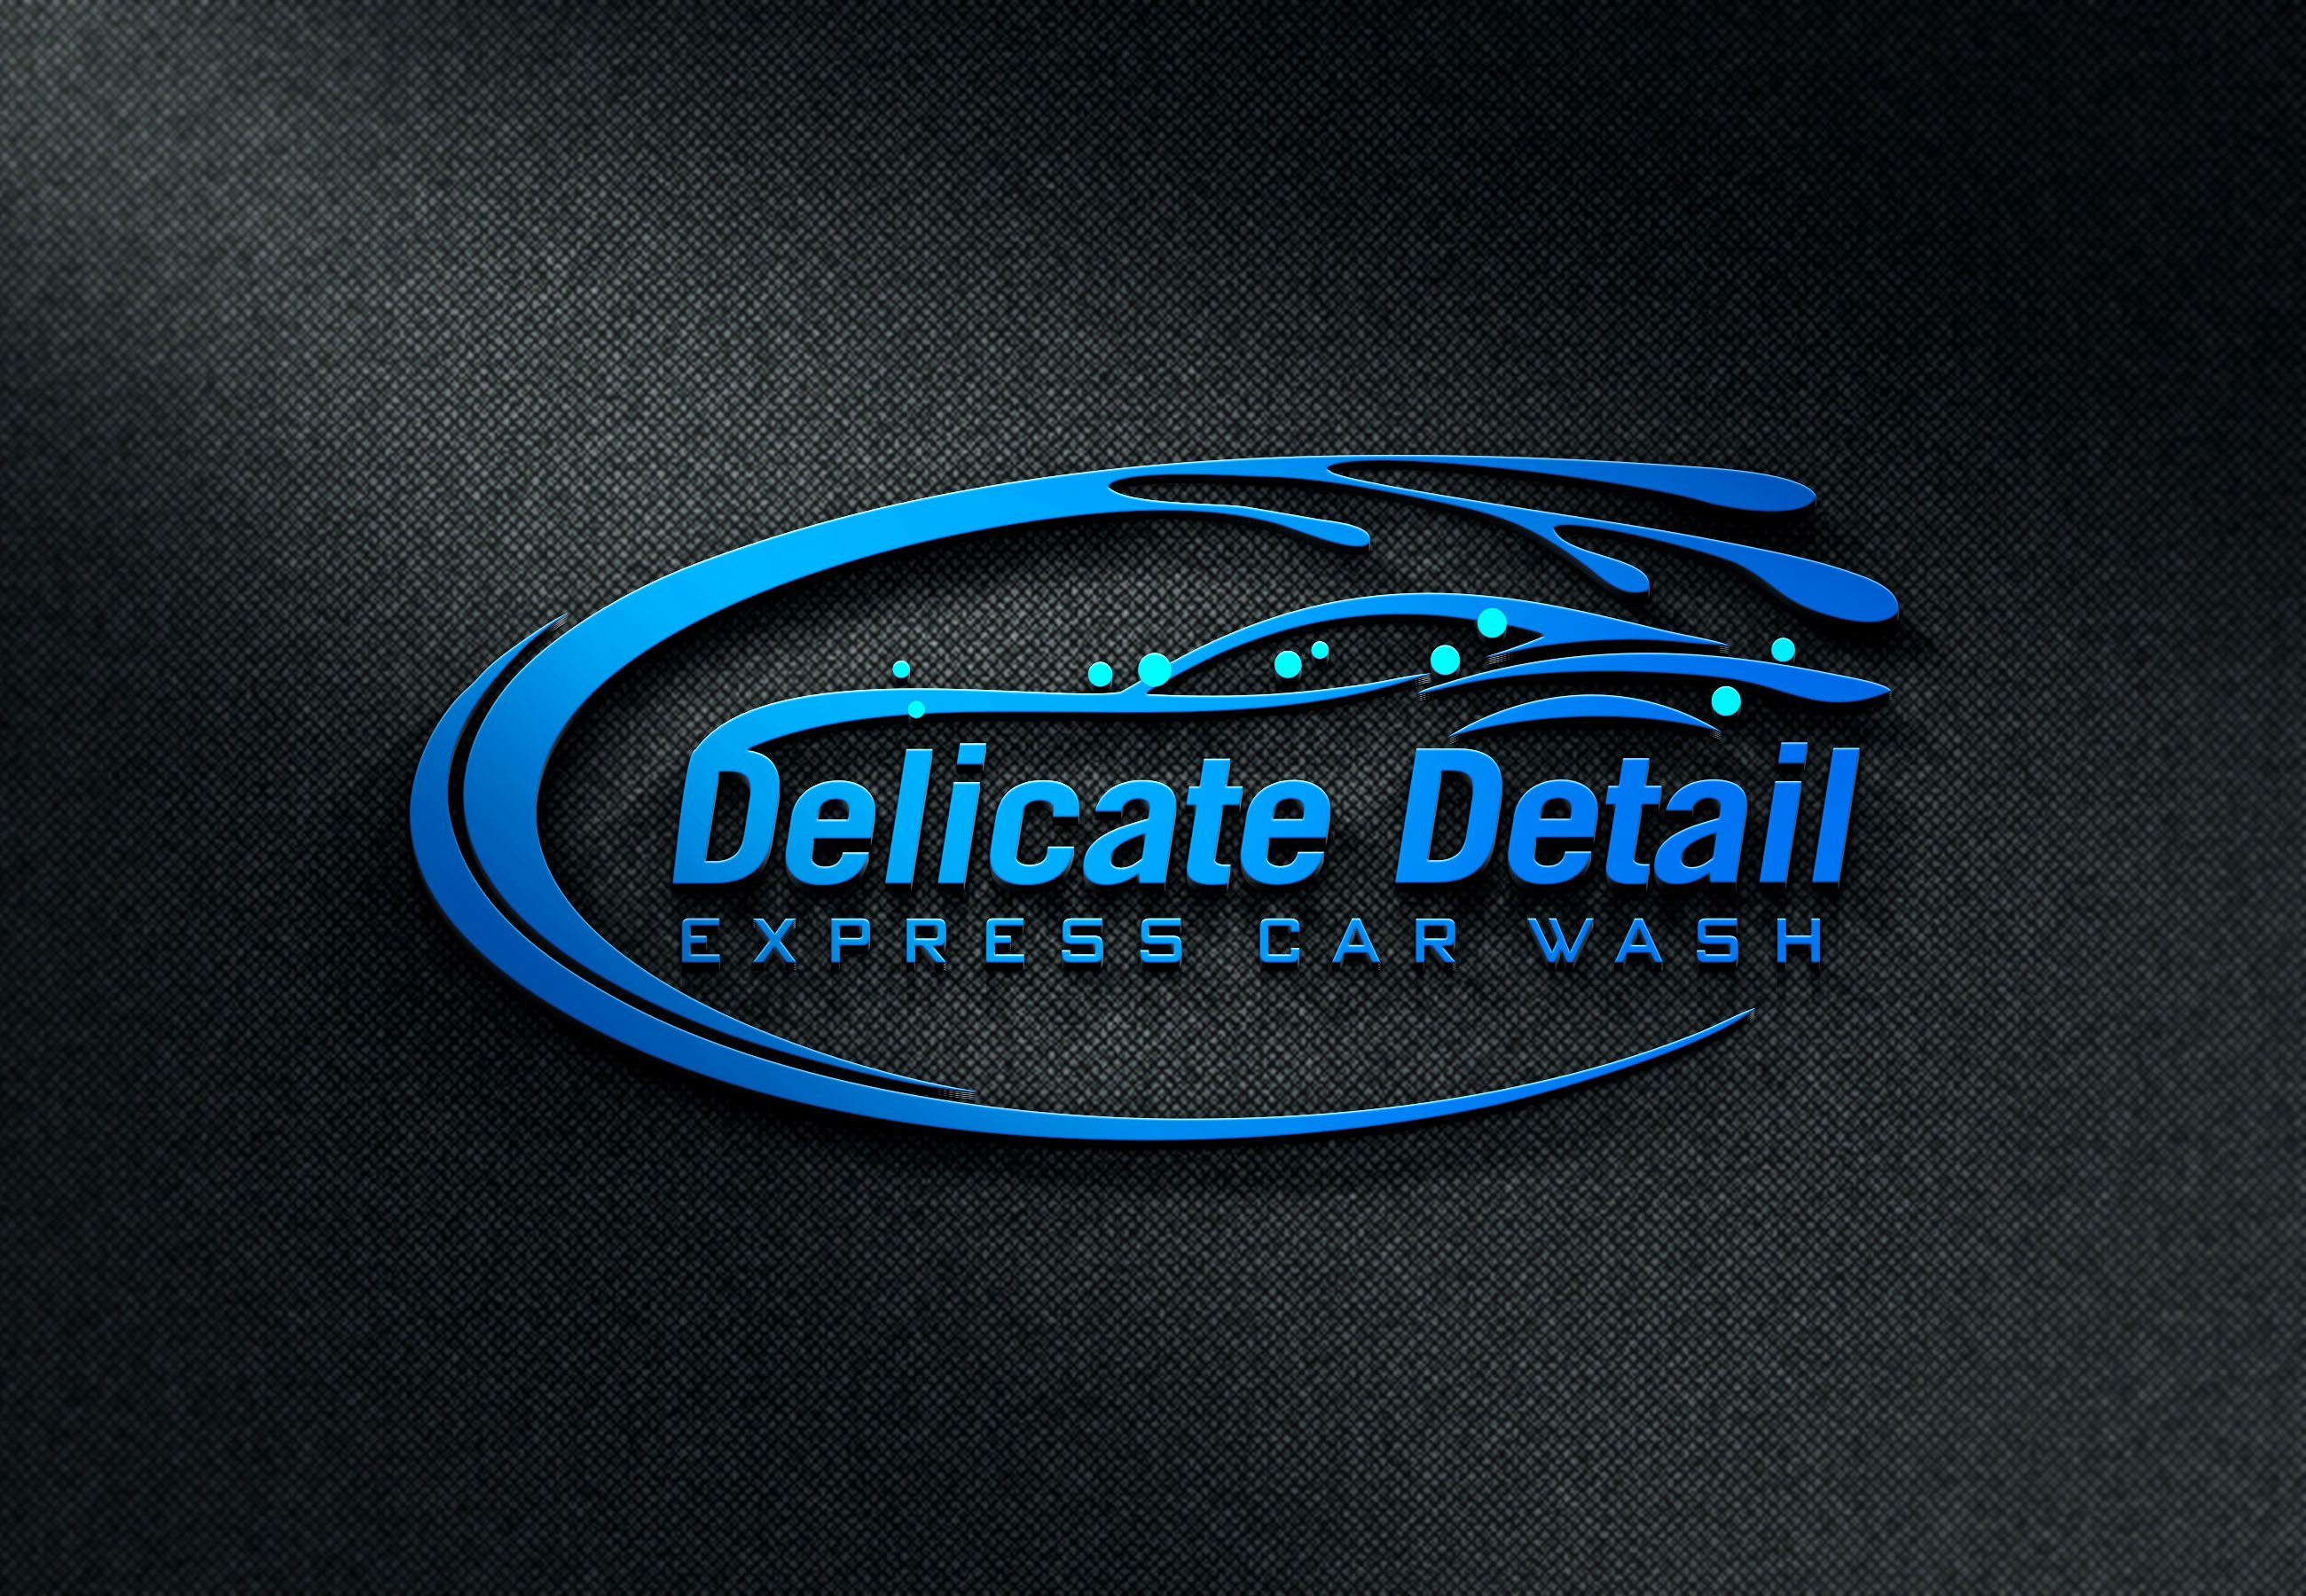 Design logo for business express car wash Detailing Car